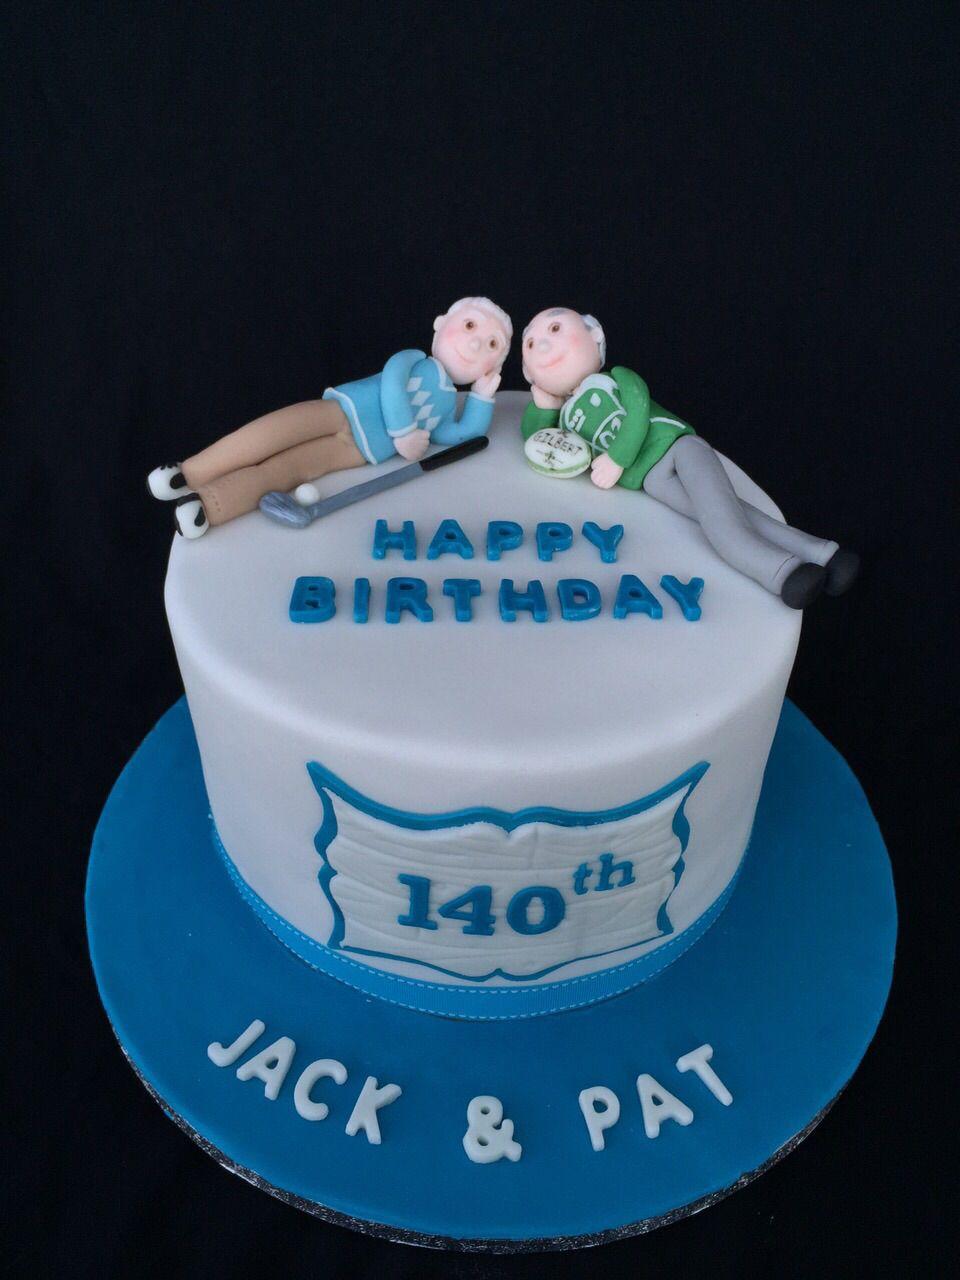 Twin Brother Birthday Cake 70th Birthday Cake 70th Cakes